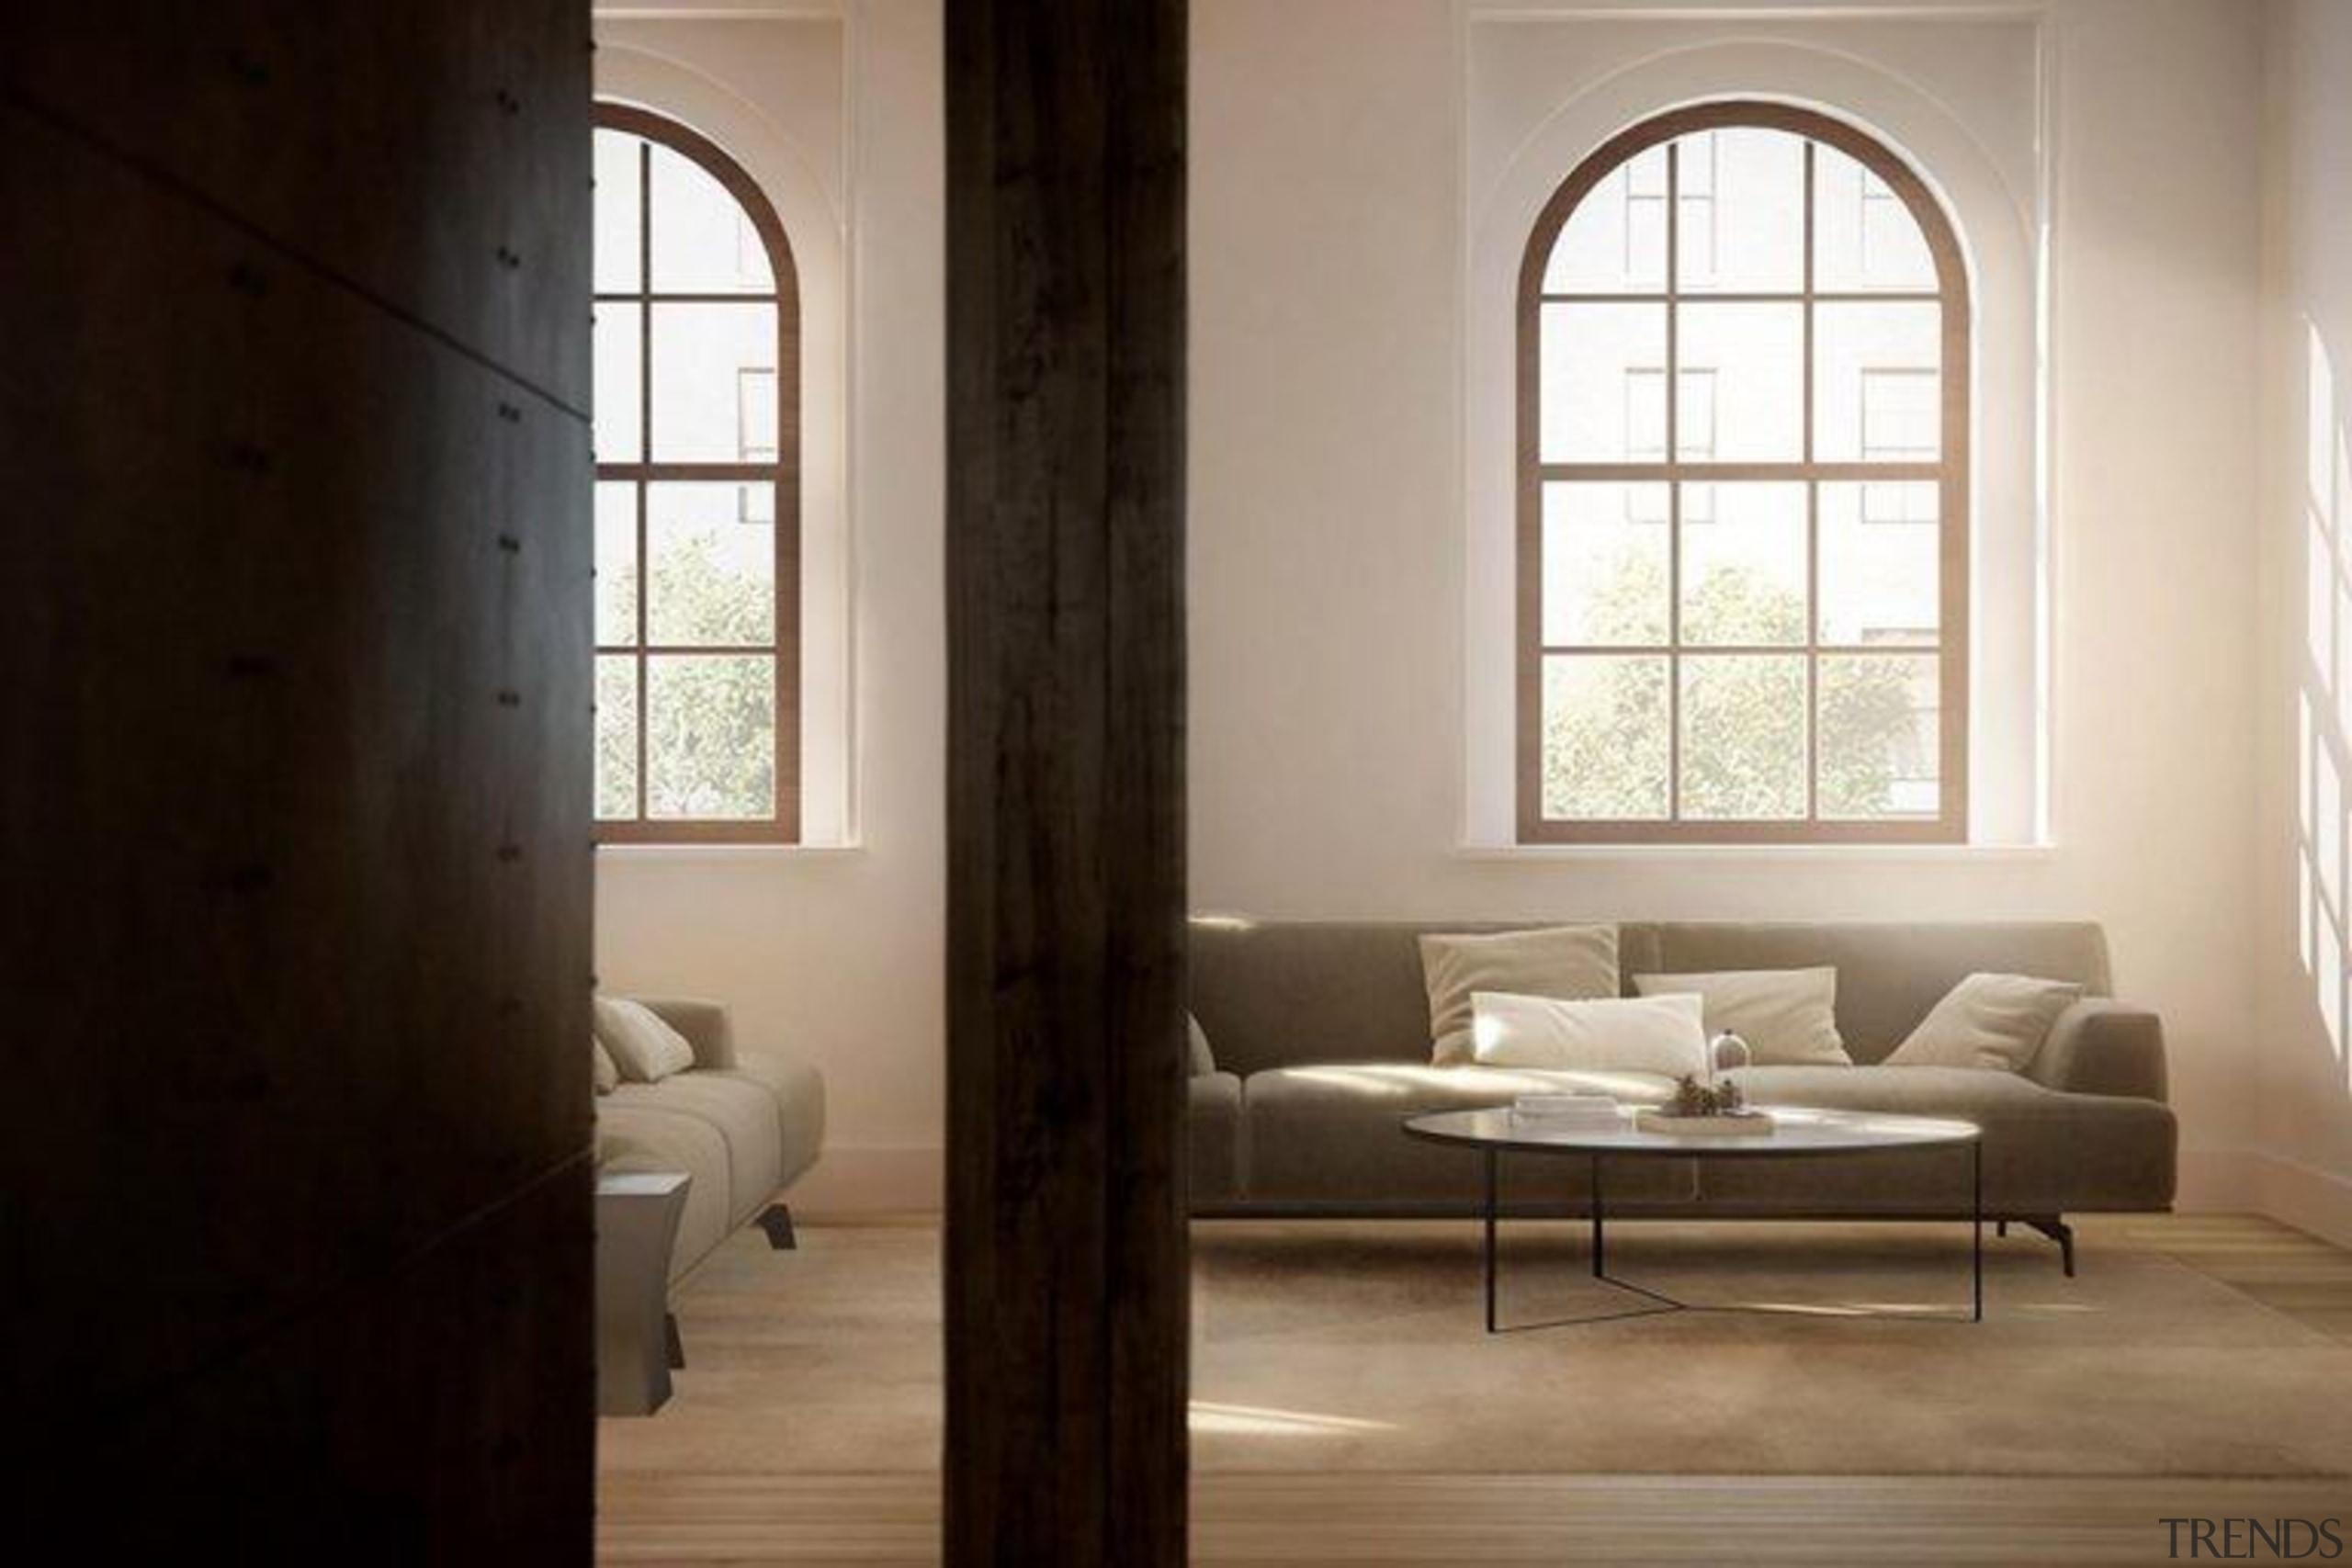 Original story from Trulia daylighting, floor, flooring, furniture, home, interior design, table, window, wood, black, gray